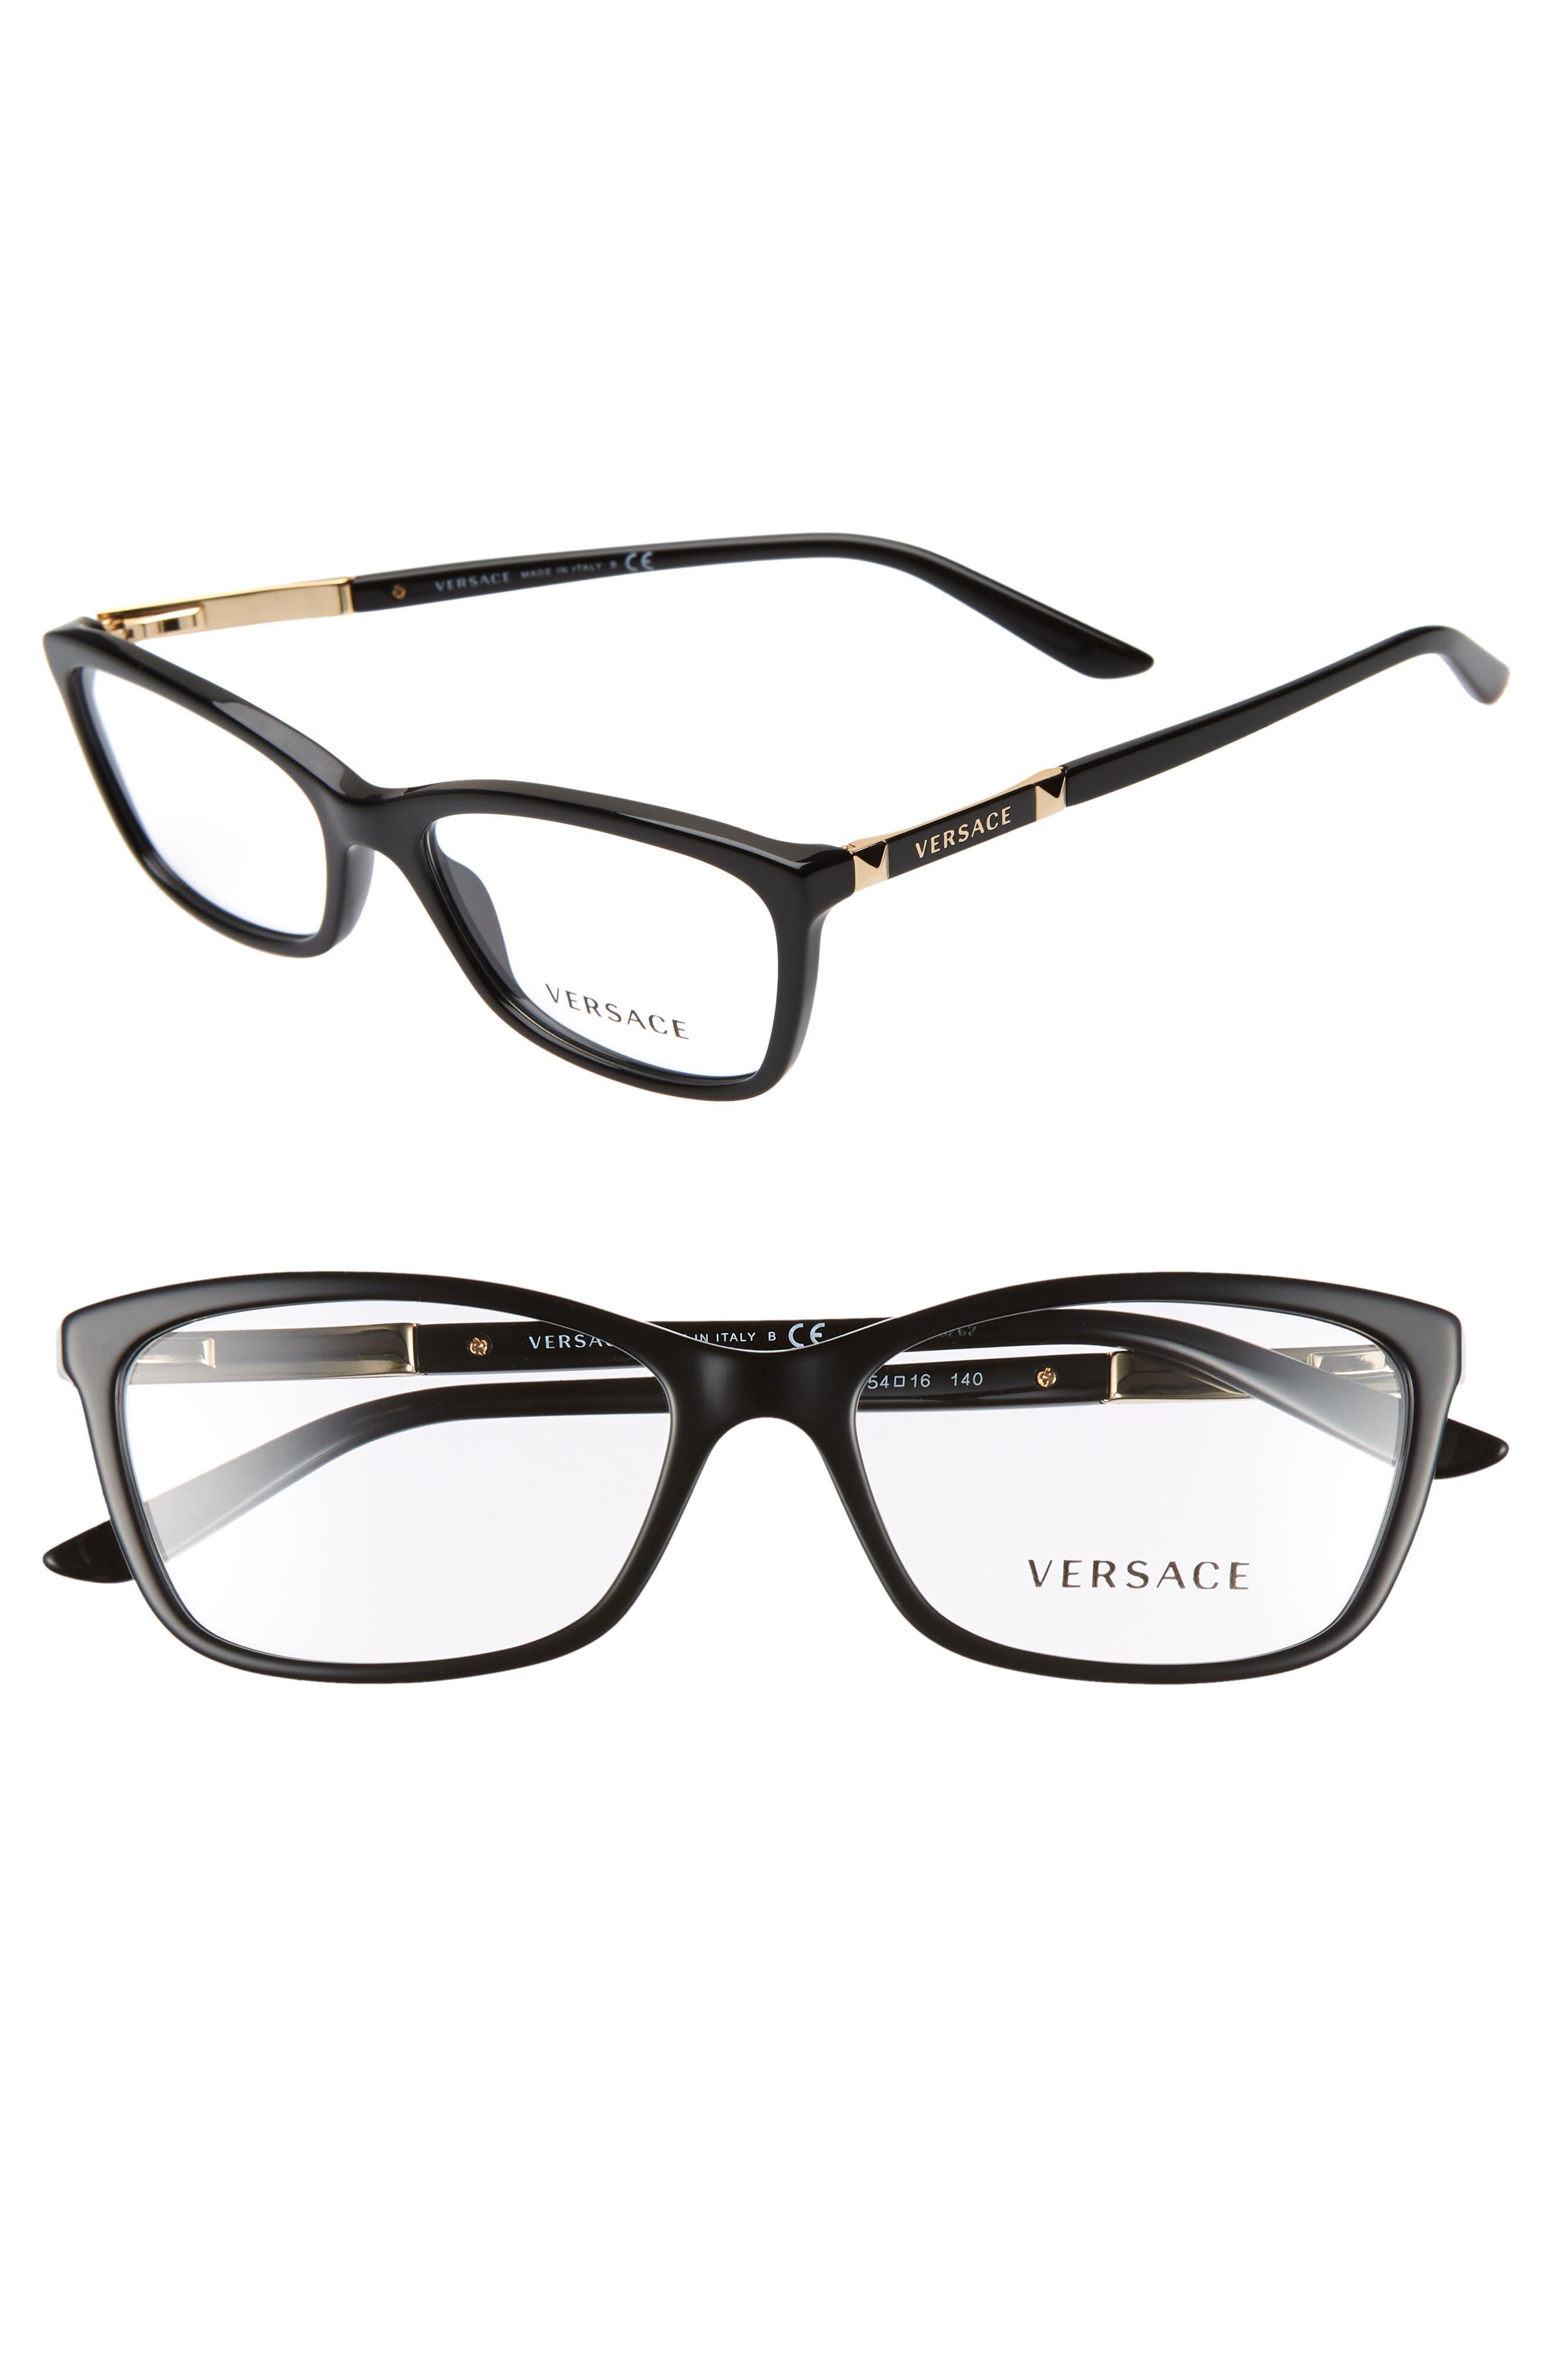 995bc4b164a Women s Versace Eyeglasses